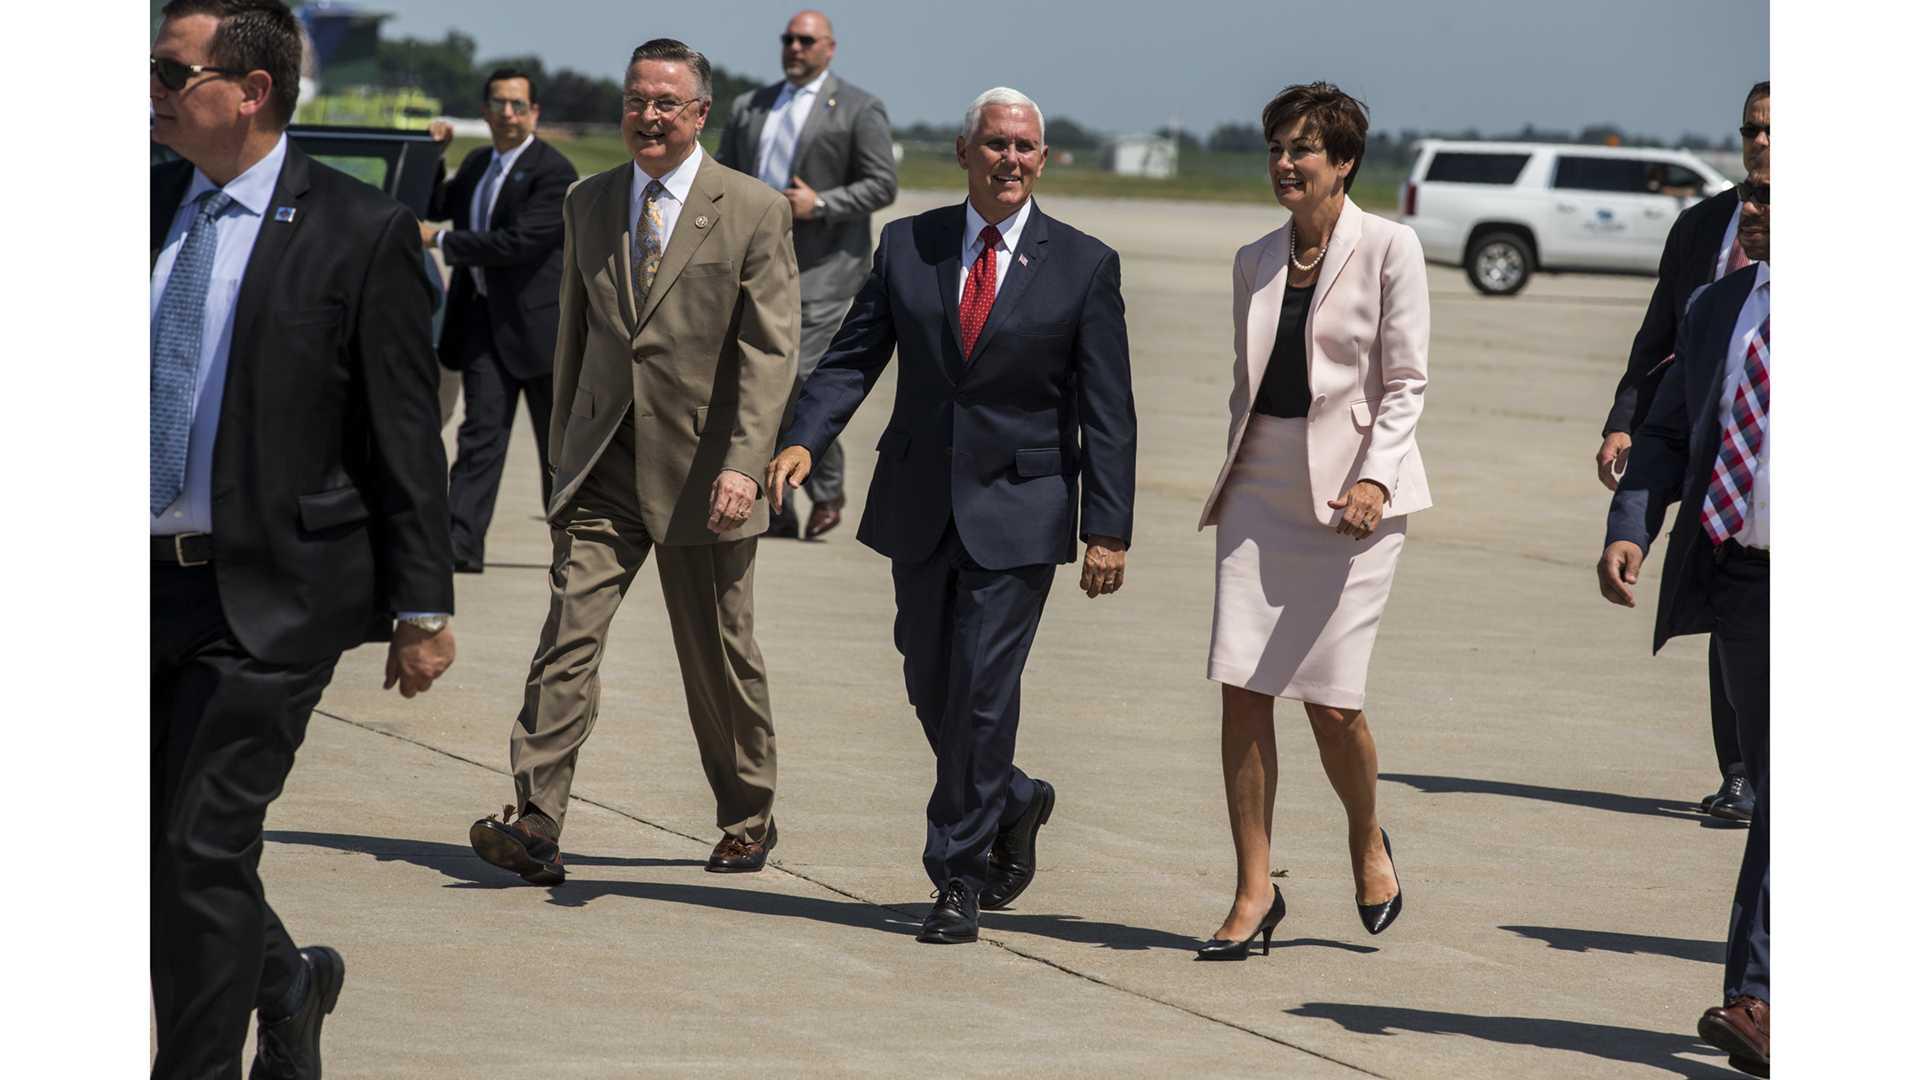 VP Pence discusses tax cuts, tariffs in Cedar Rapids